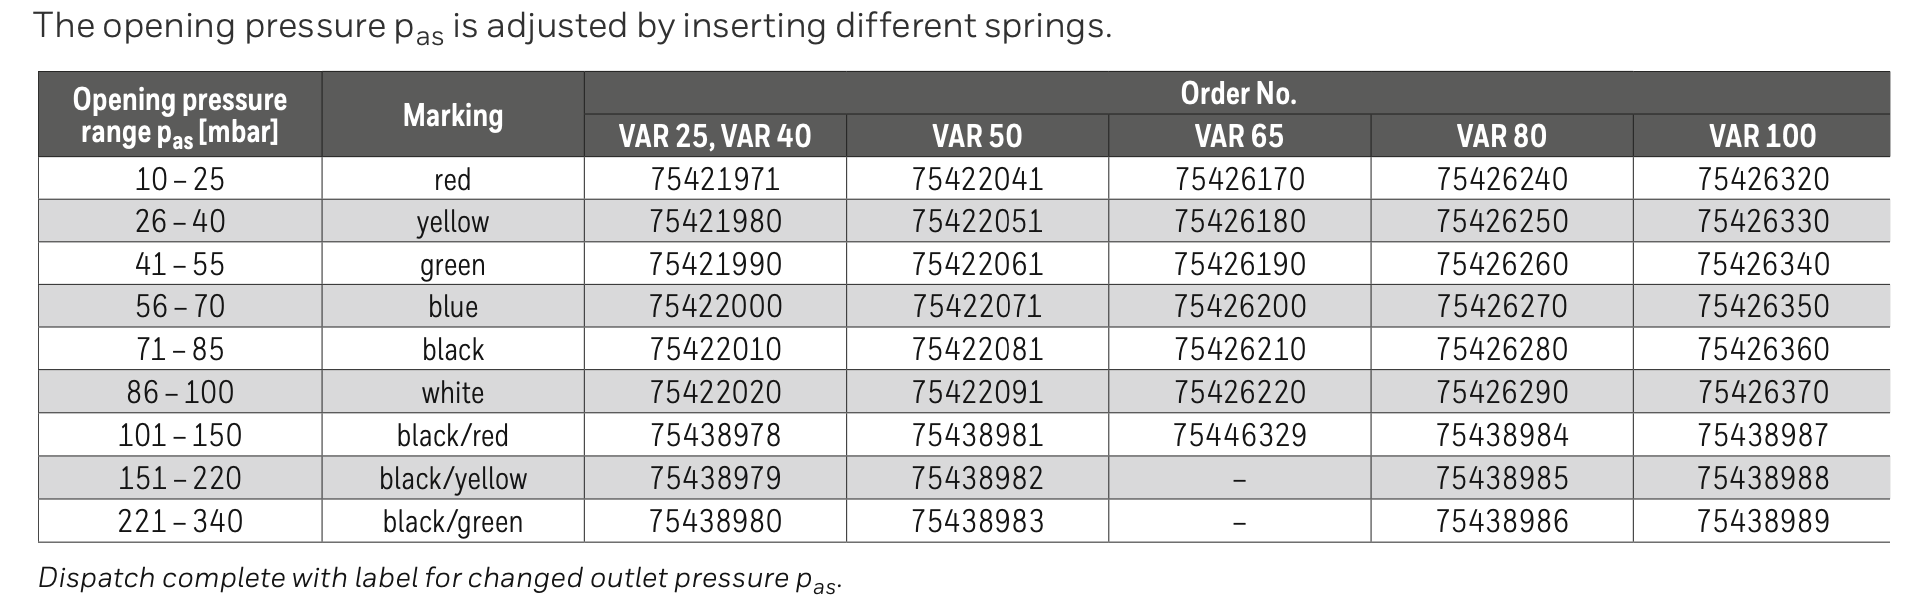 Krom Schroder Pressure Control and Relief Regulator data sheet